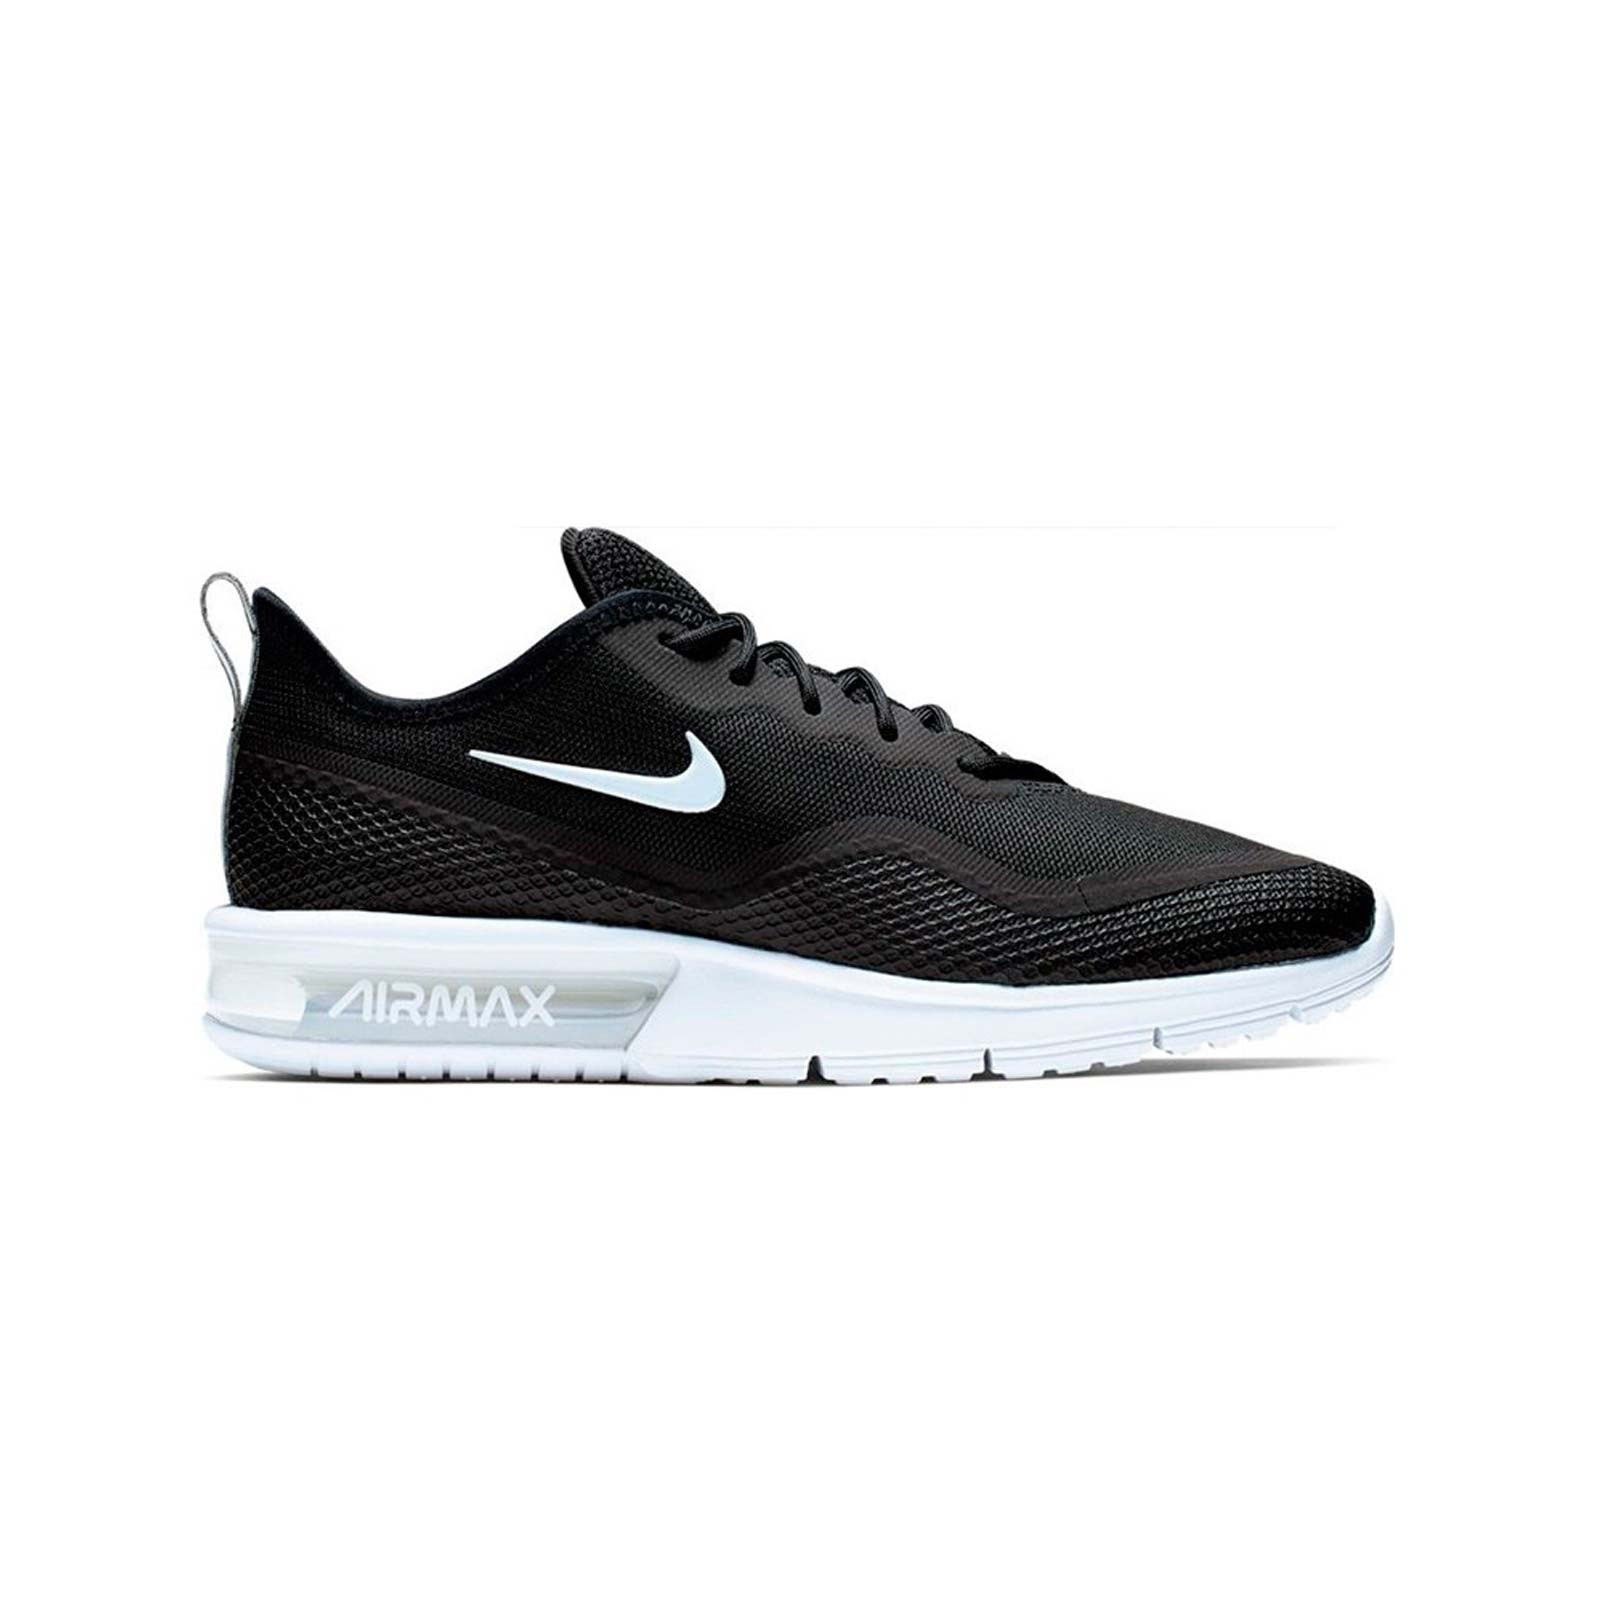 Zapatillas Nike Air Max Sequent 4.5 Running para Hombre